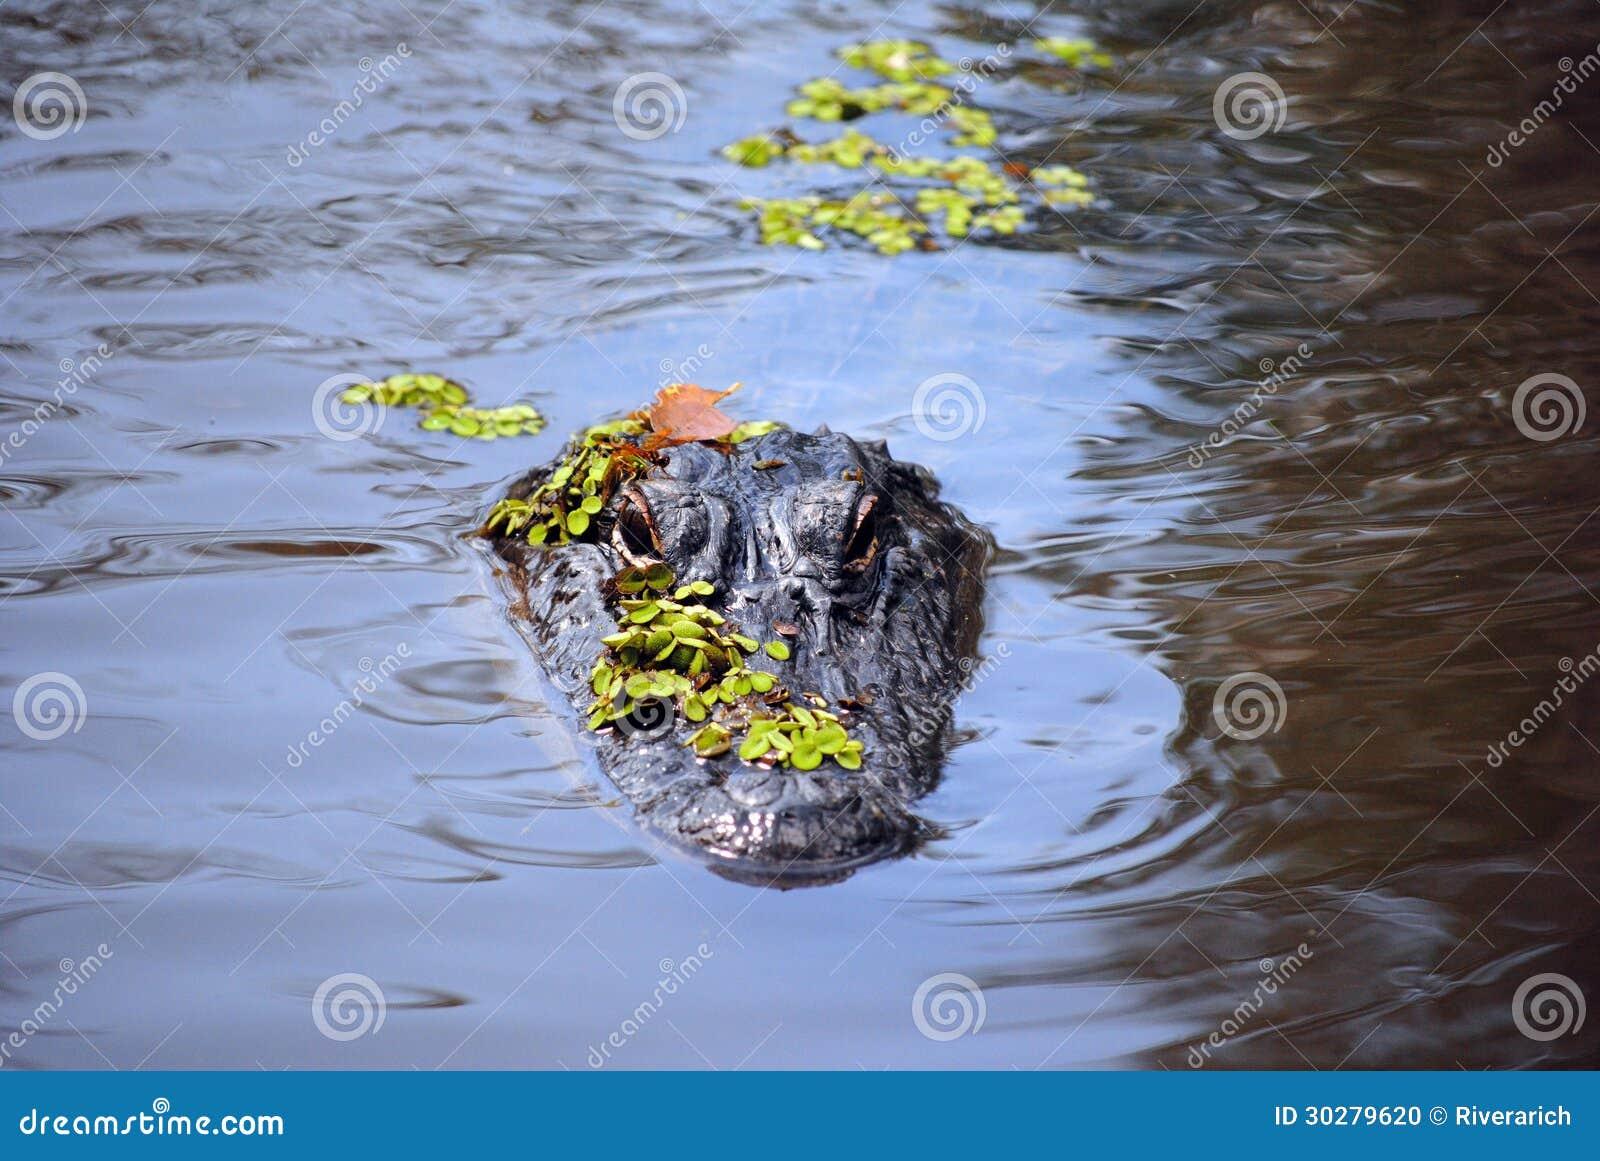 在沼泽的Aligator